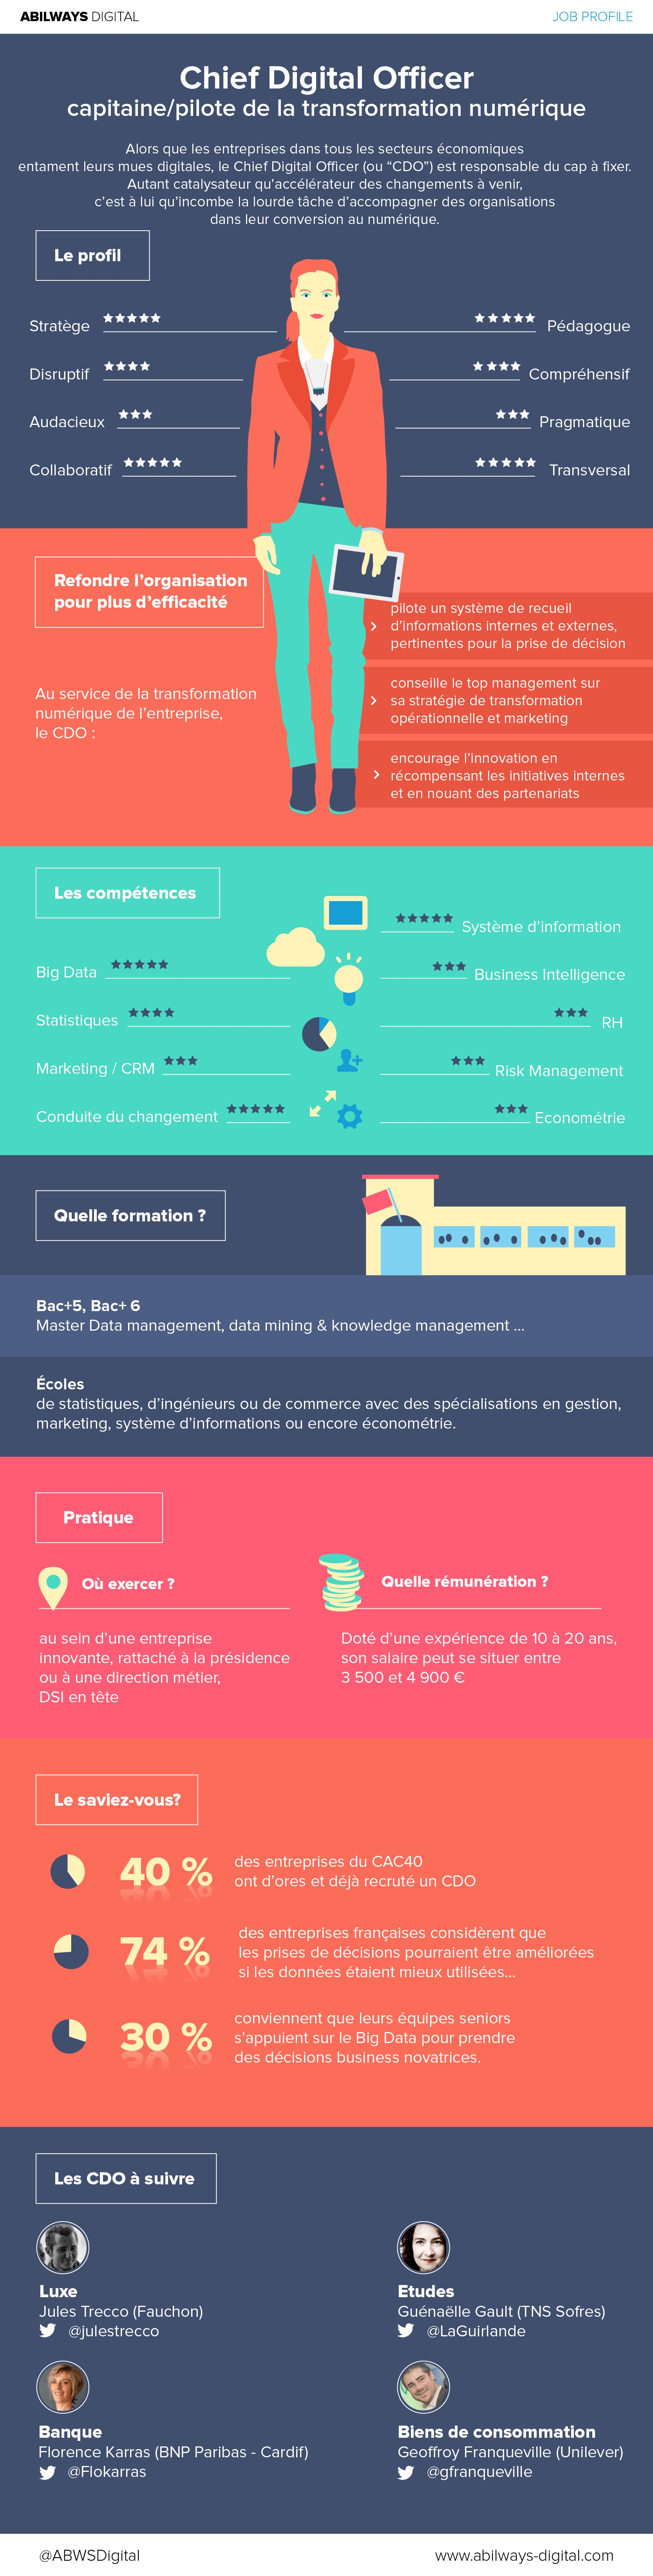 Nostromo agence de communication infographie transformation numerique cdo